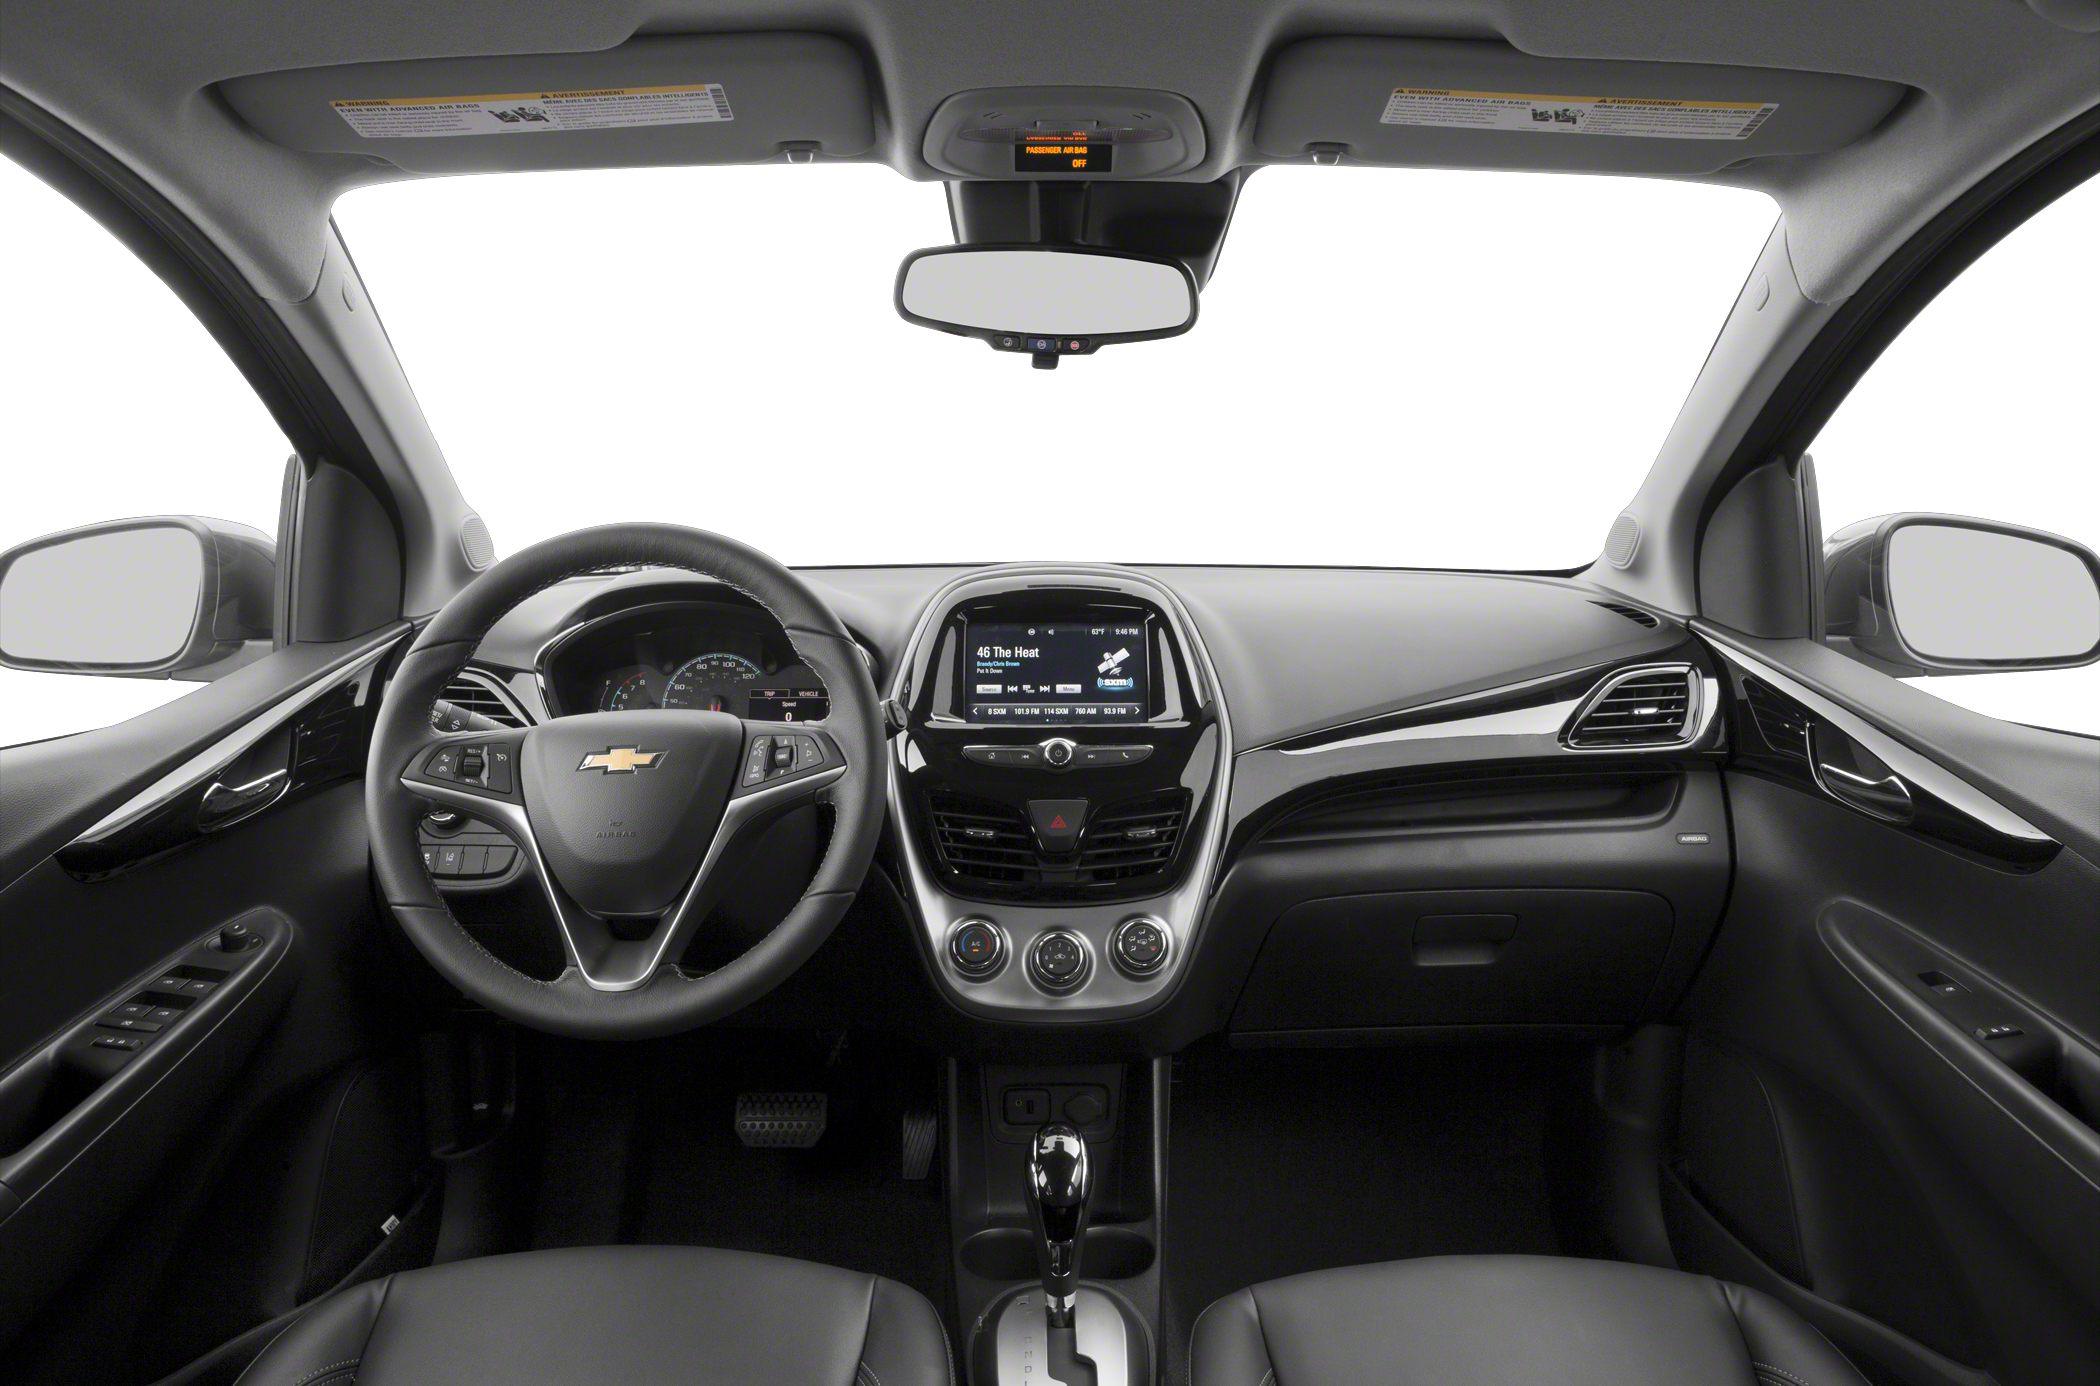 2018 Chevrolet Spark Spark Ls Manual 4dr Hatchback Colors | Autos Post